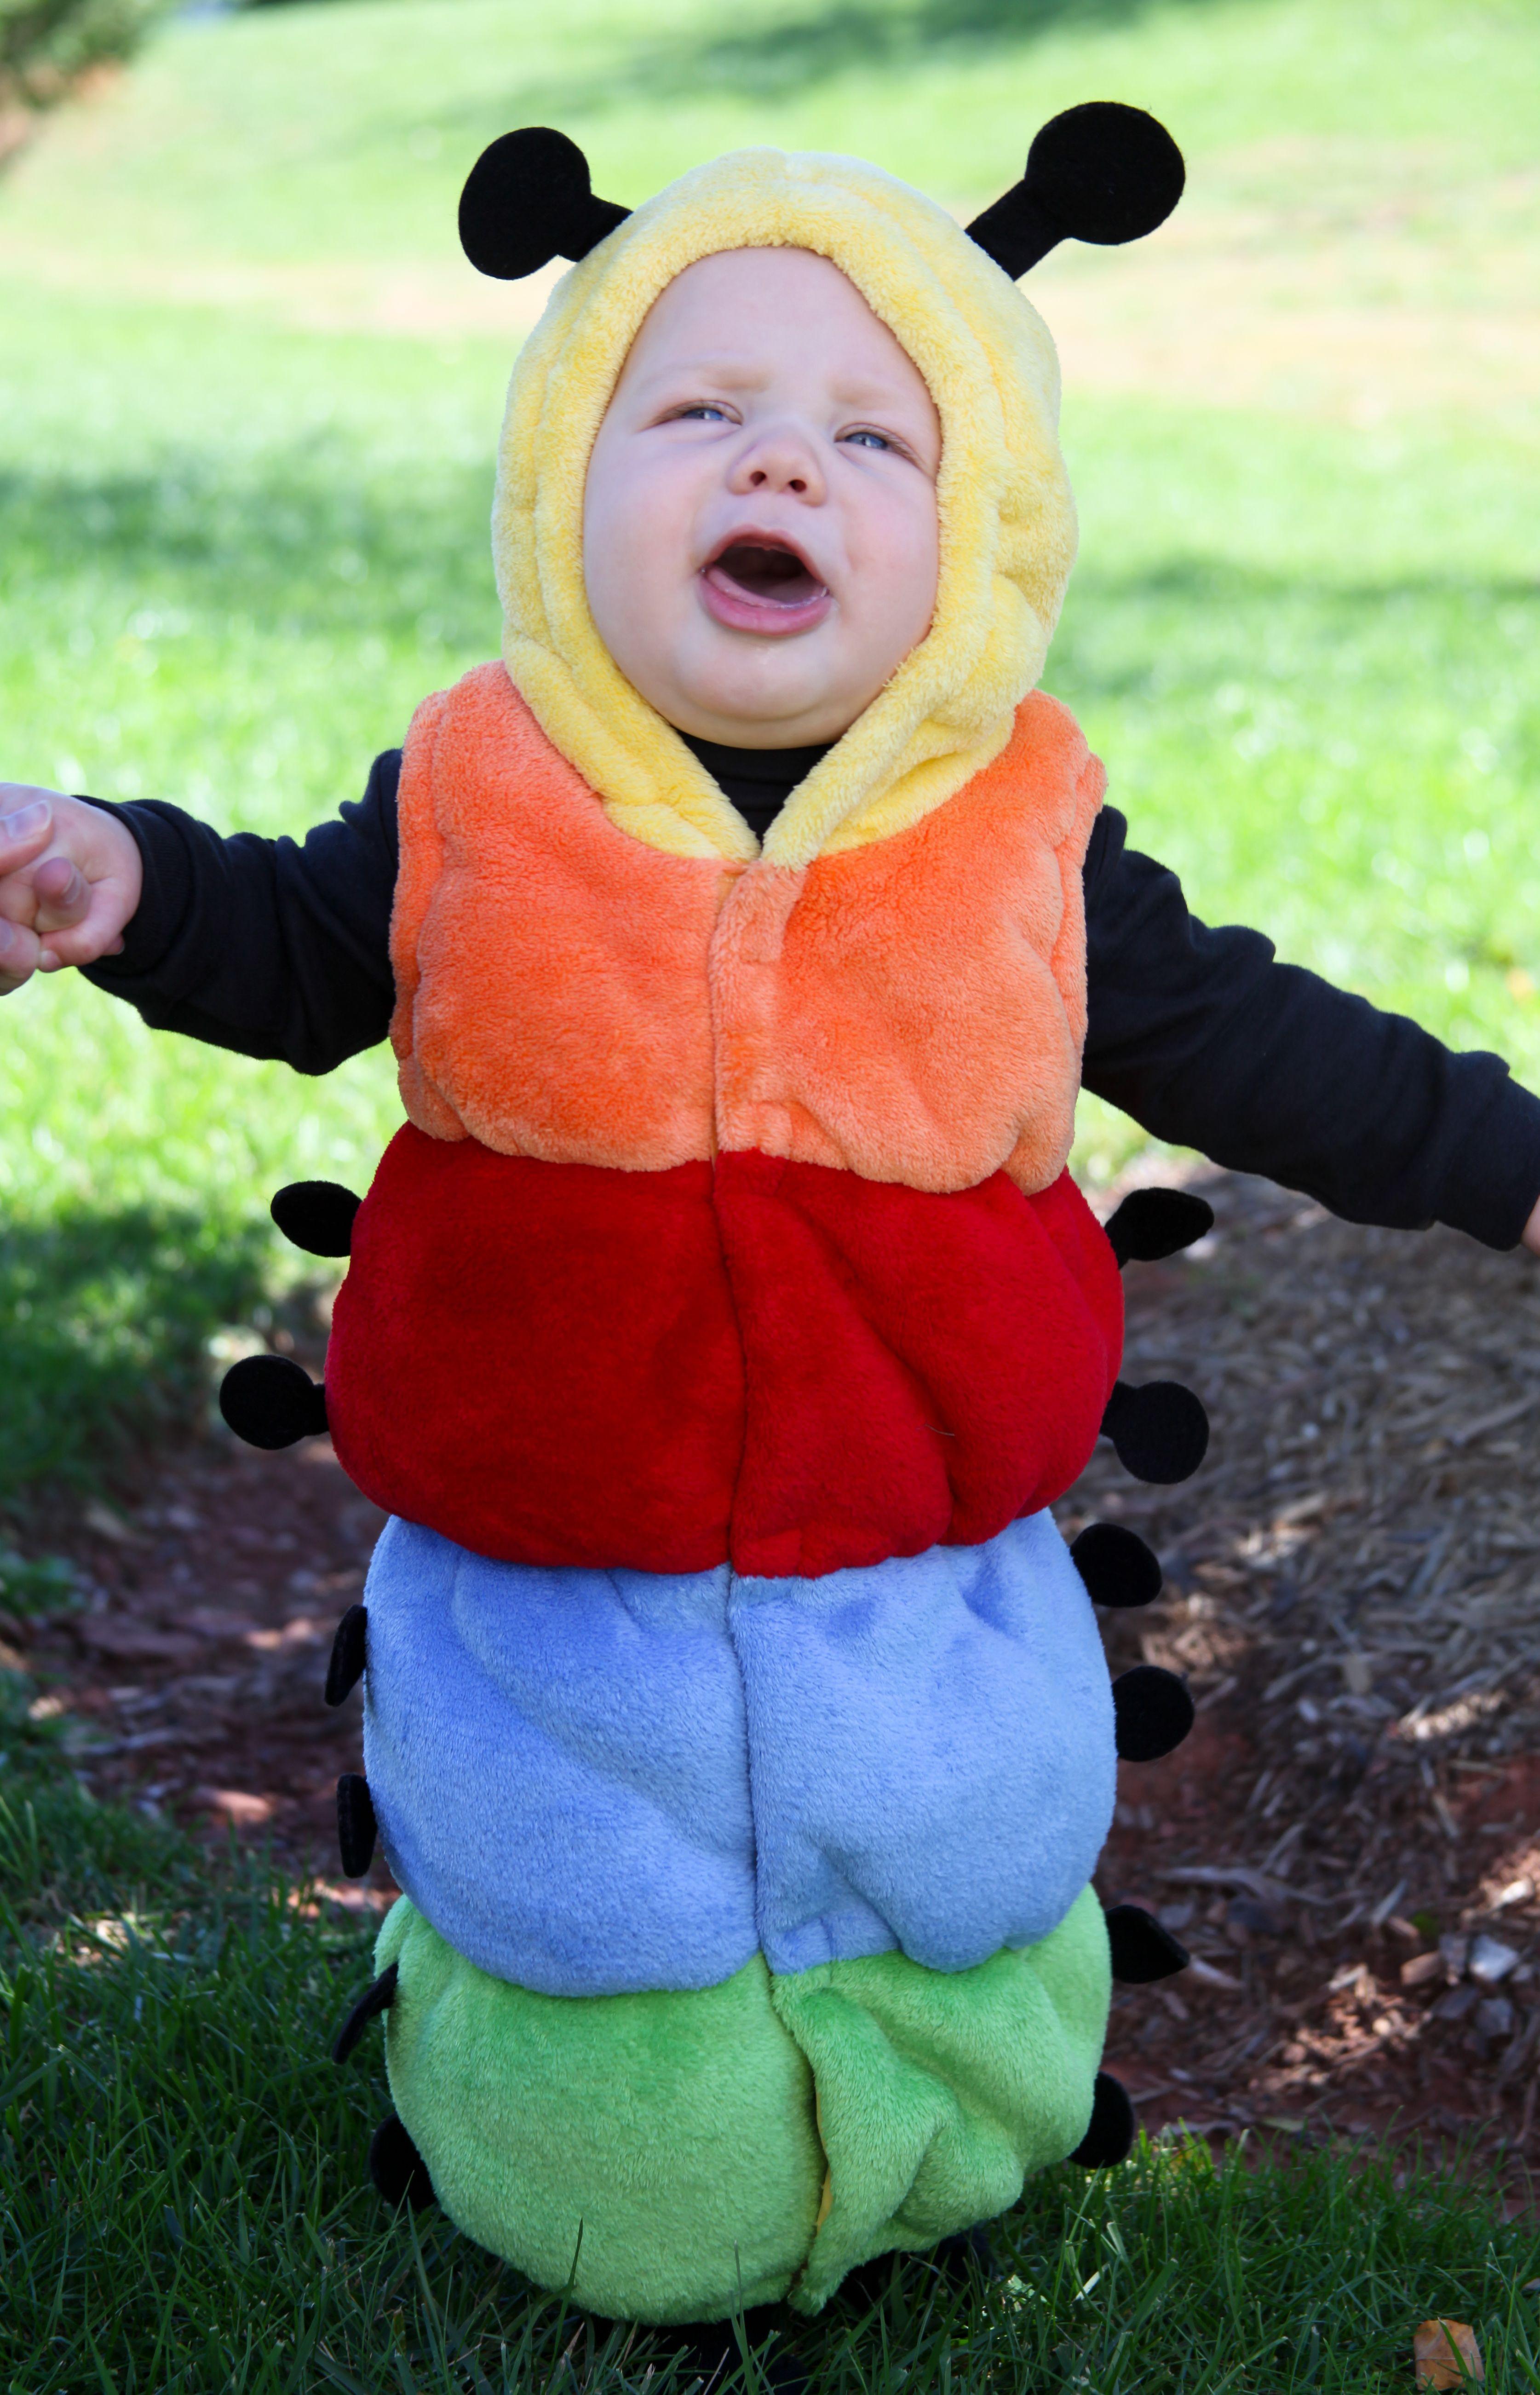 Caterpillar Halloween Costume Baby Baby Babyyyy OHHH